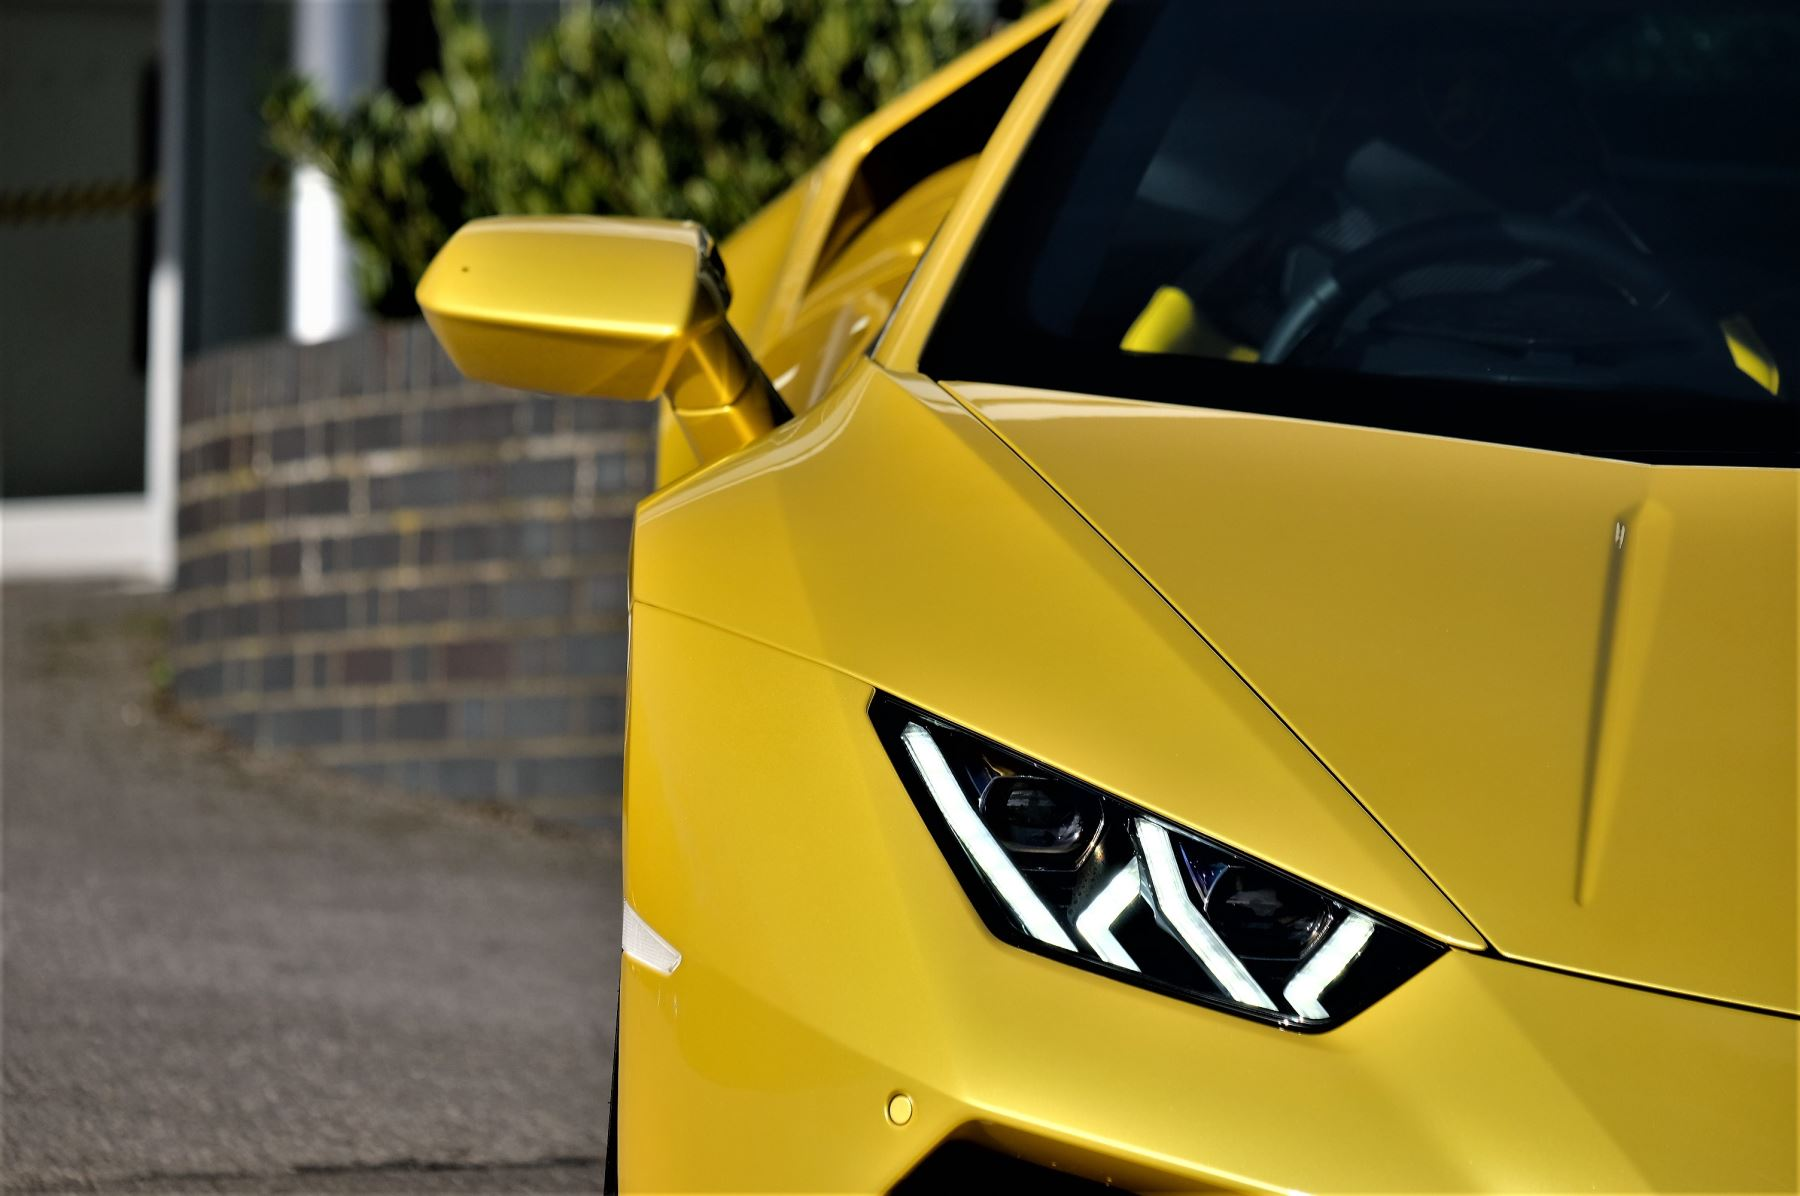 Lamborghini Huracan EVO 5.2 V10 610 2dr Auto RWD image 10